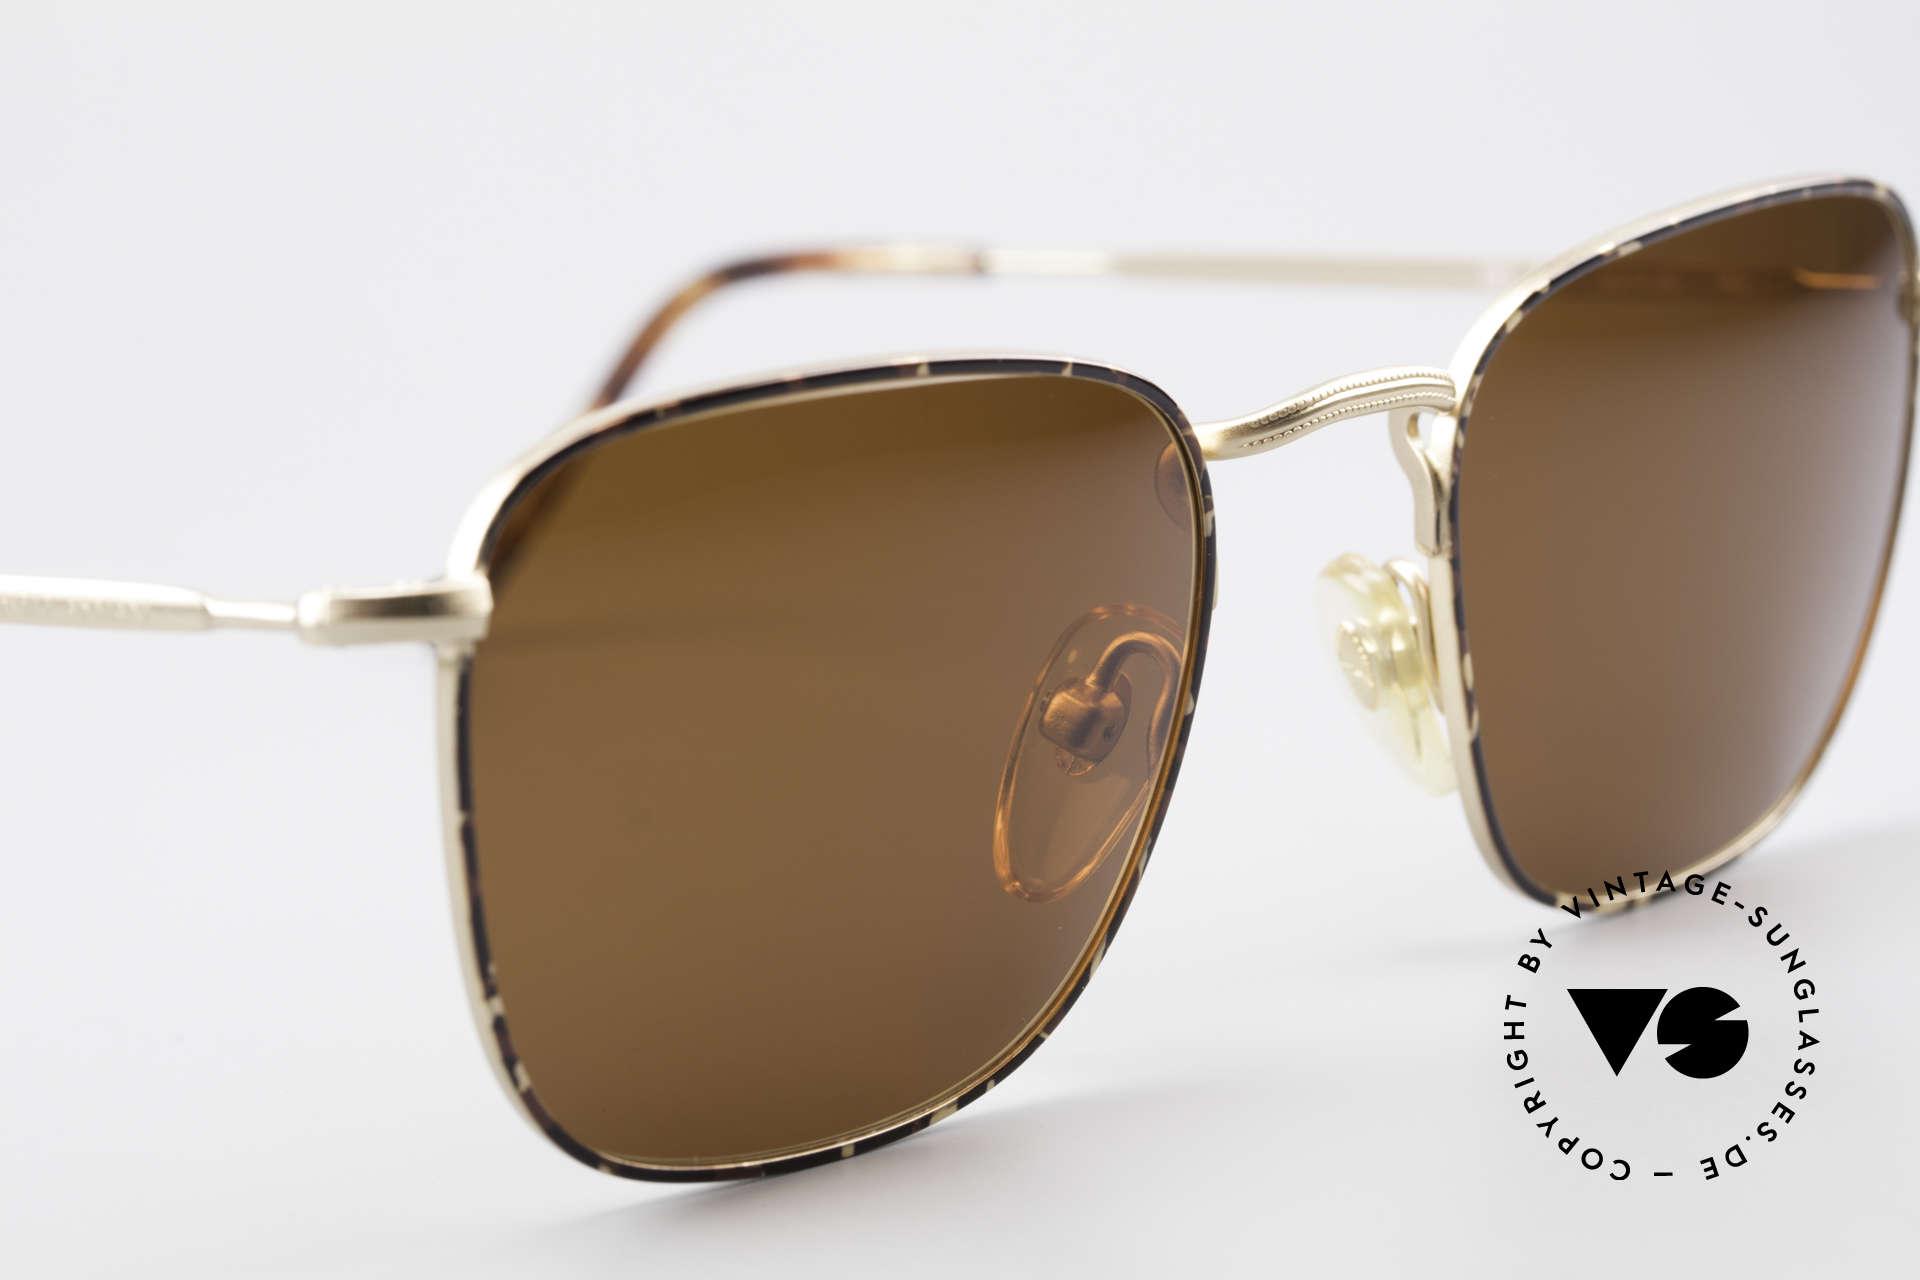 Giorgio Armani 137 Square Panto Vintage Shades, unworn (like all our vintage GIORGIO Armani shades), Made for Men